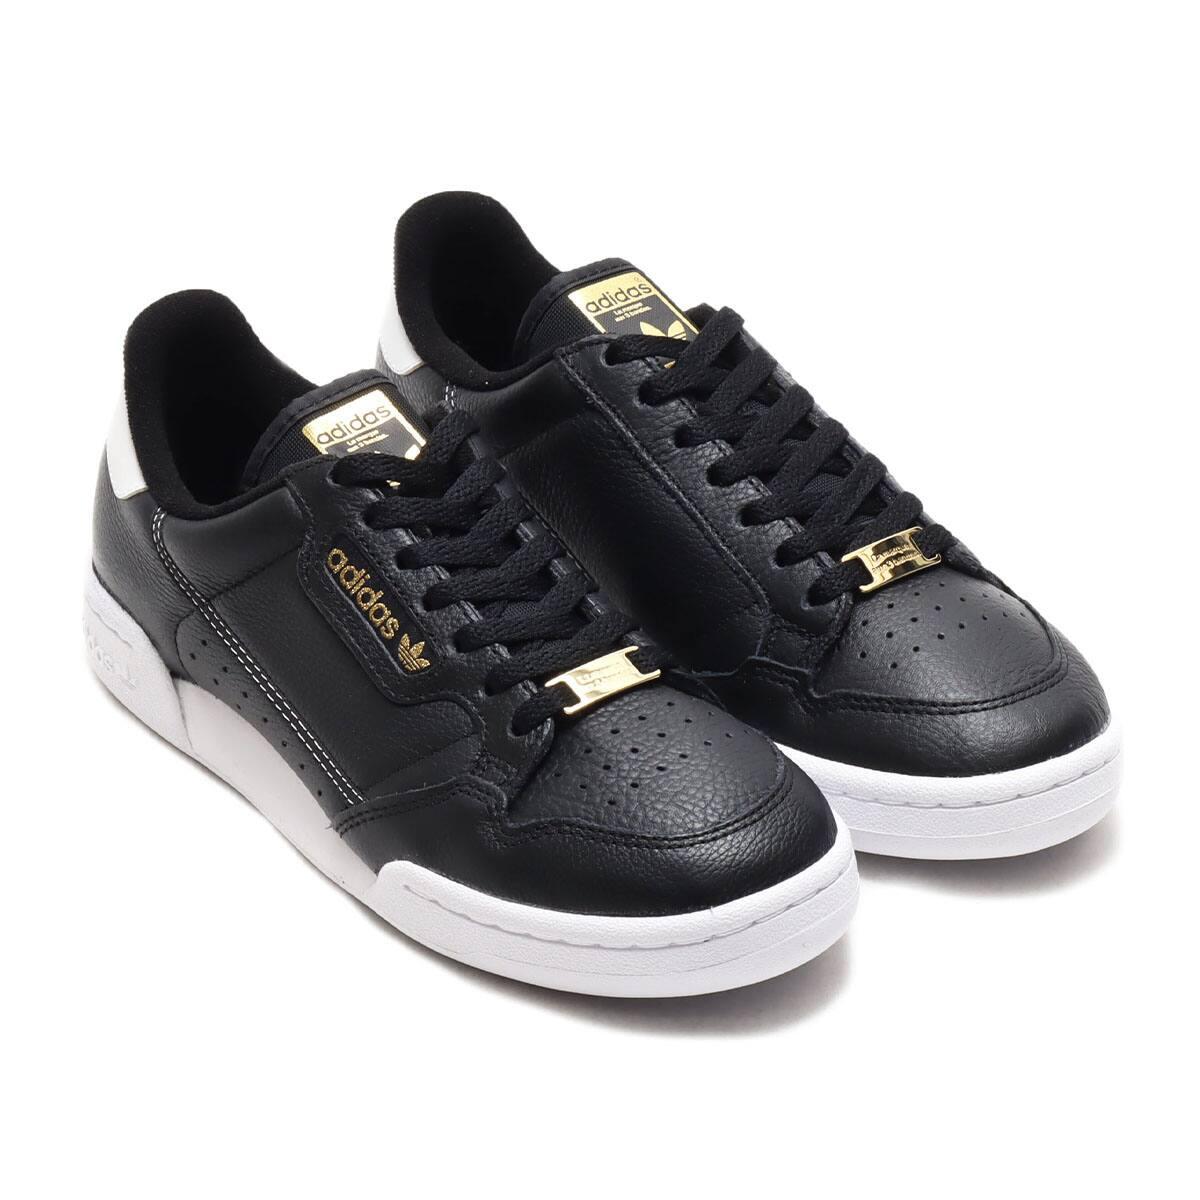 adidas CONTINENTAL 80 CORE BLACK/CORE BLACK/FOOTWEAR WHITE 20SS-I_photo_large